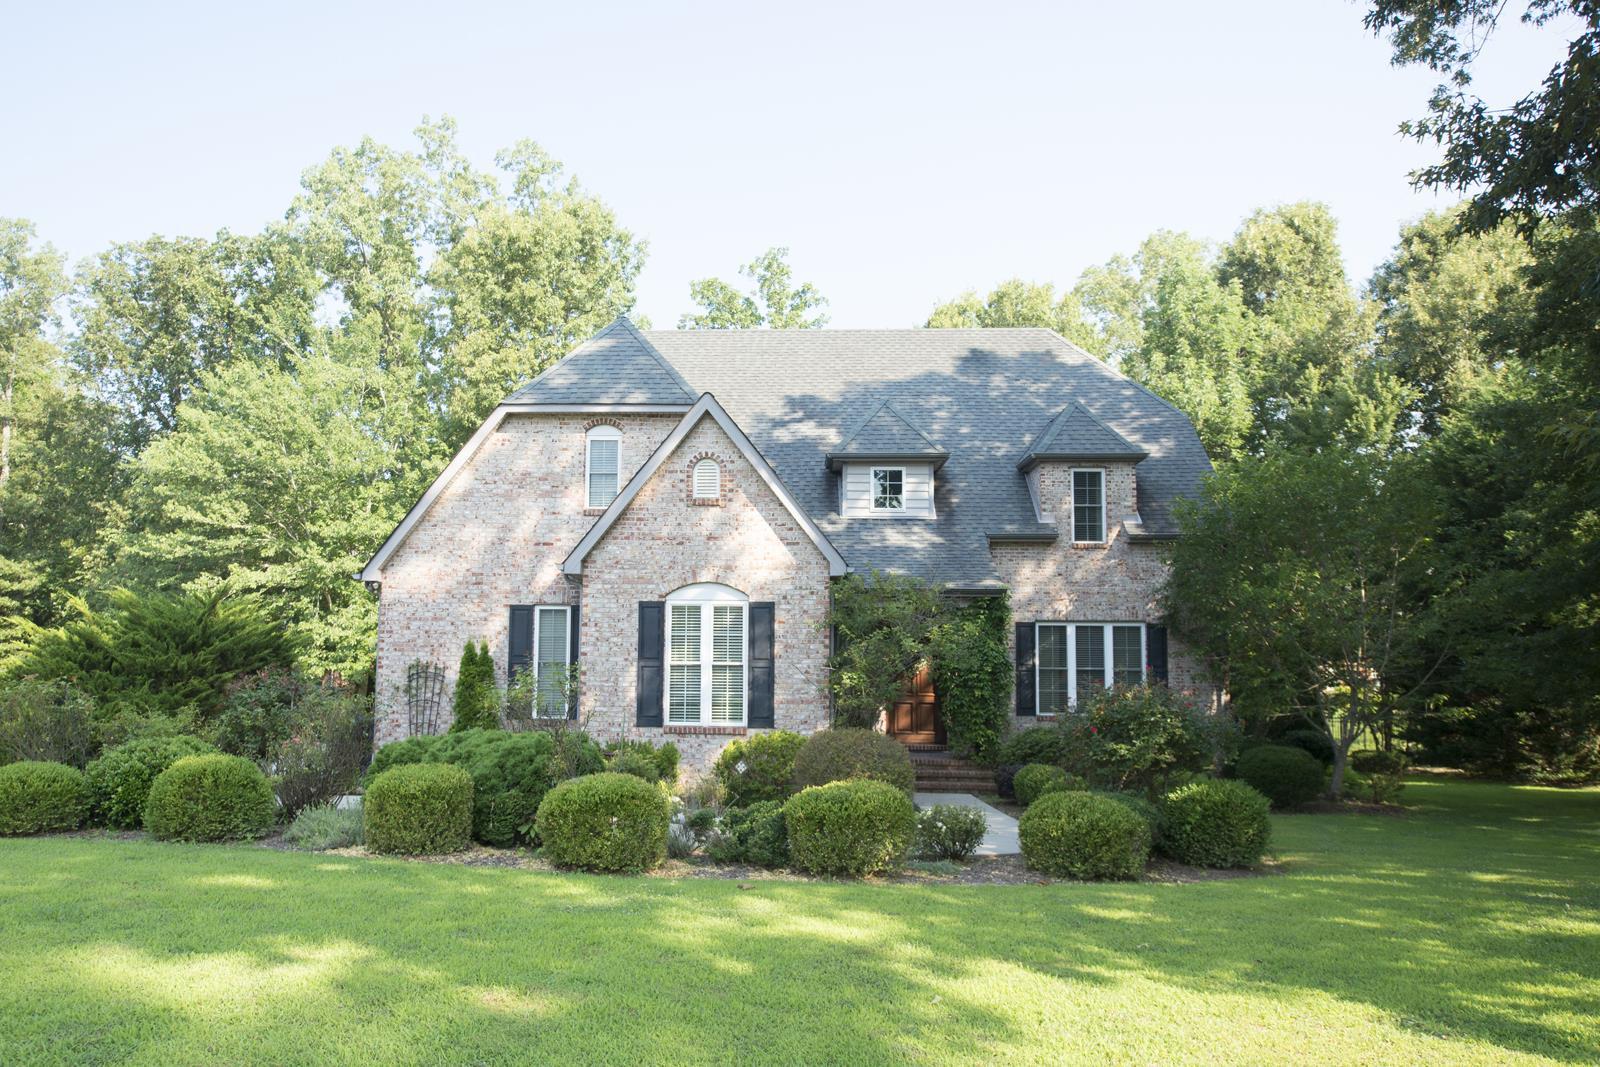 504 Albemarle Dr, Tullahoma, TN 37388 - Tullahoma, TN real estate listing